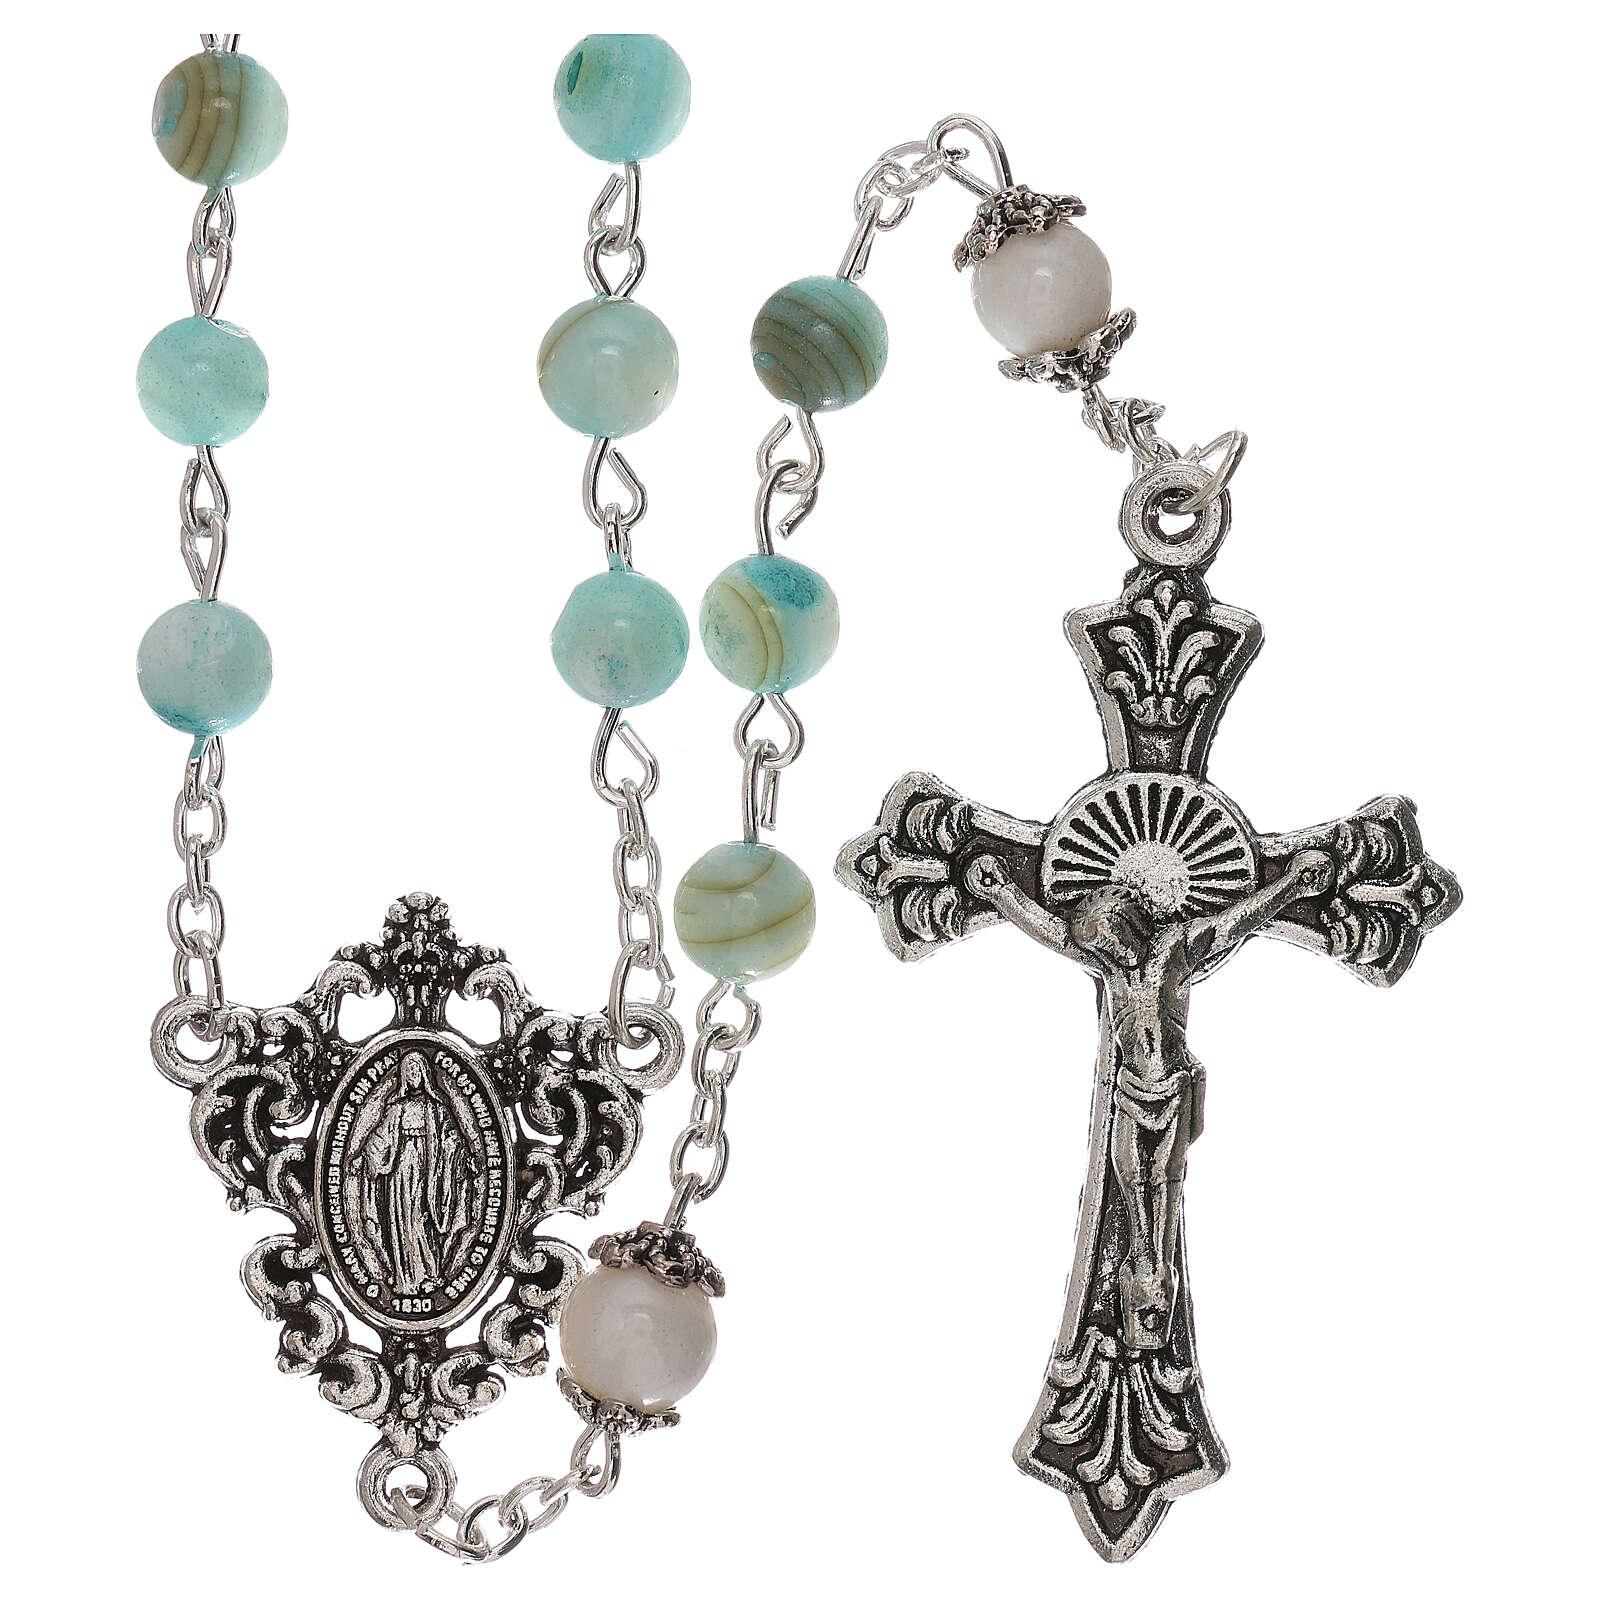 Rosario perlas agua dulce turquesa de color ámbar Virgen 4 mm 4